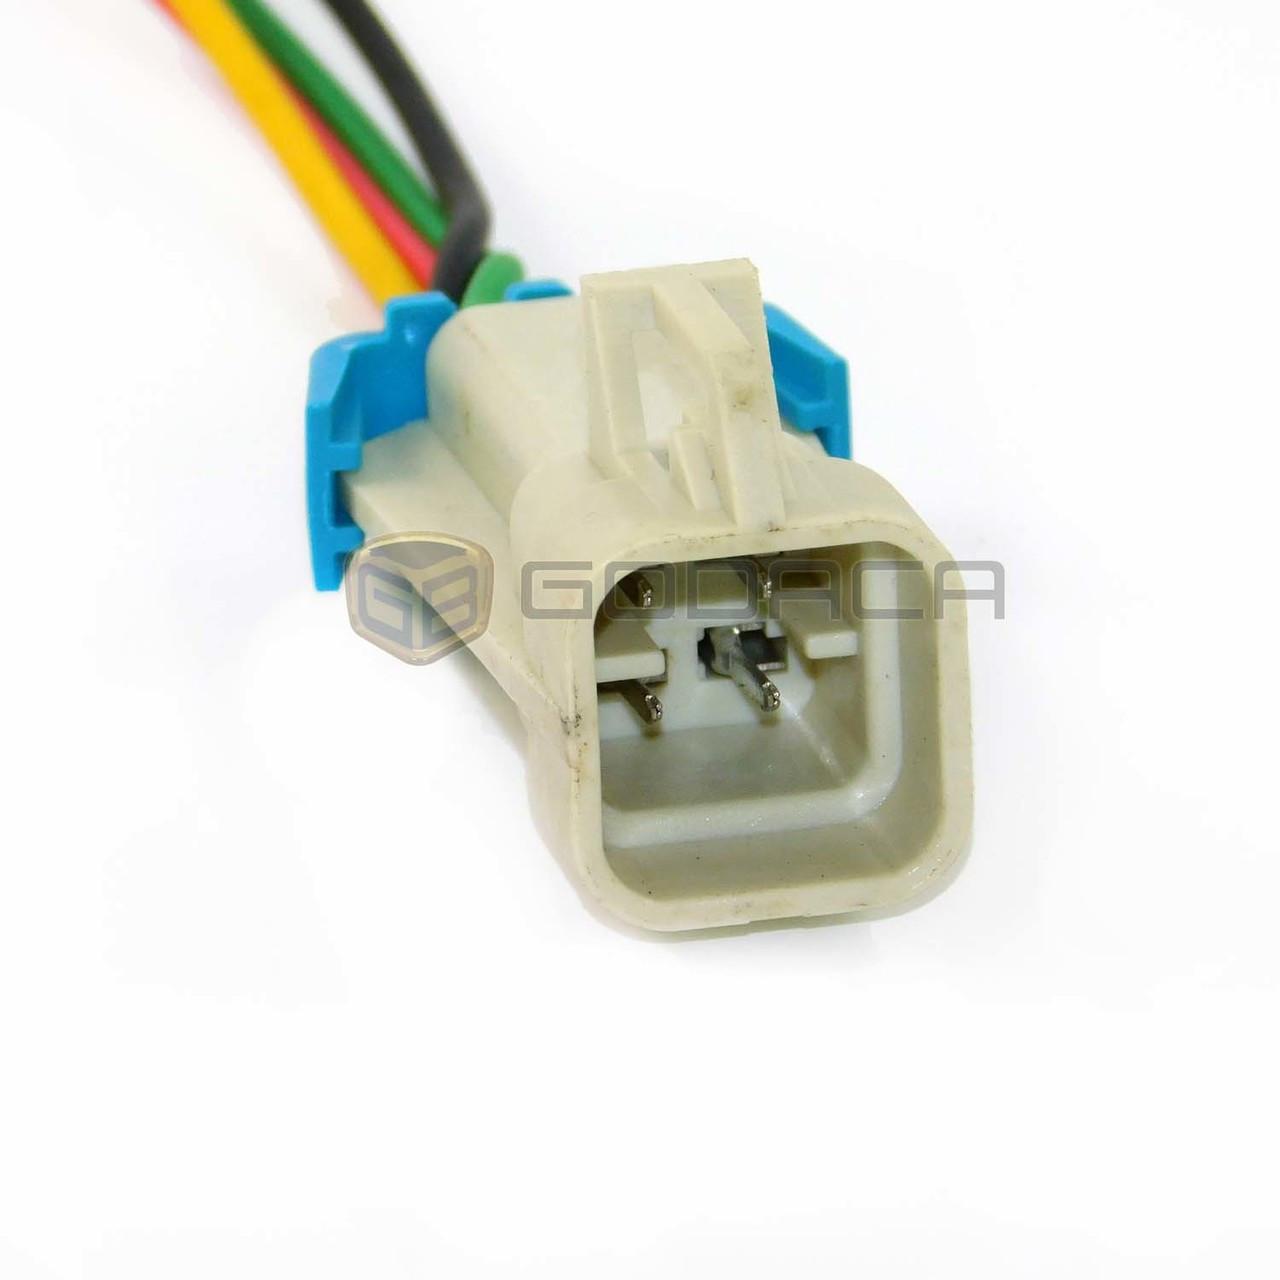 medium resolution of 1x 4 way repair connector for gm fuel pump oxygen sensor ls1 godaca llc